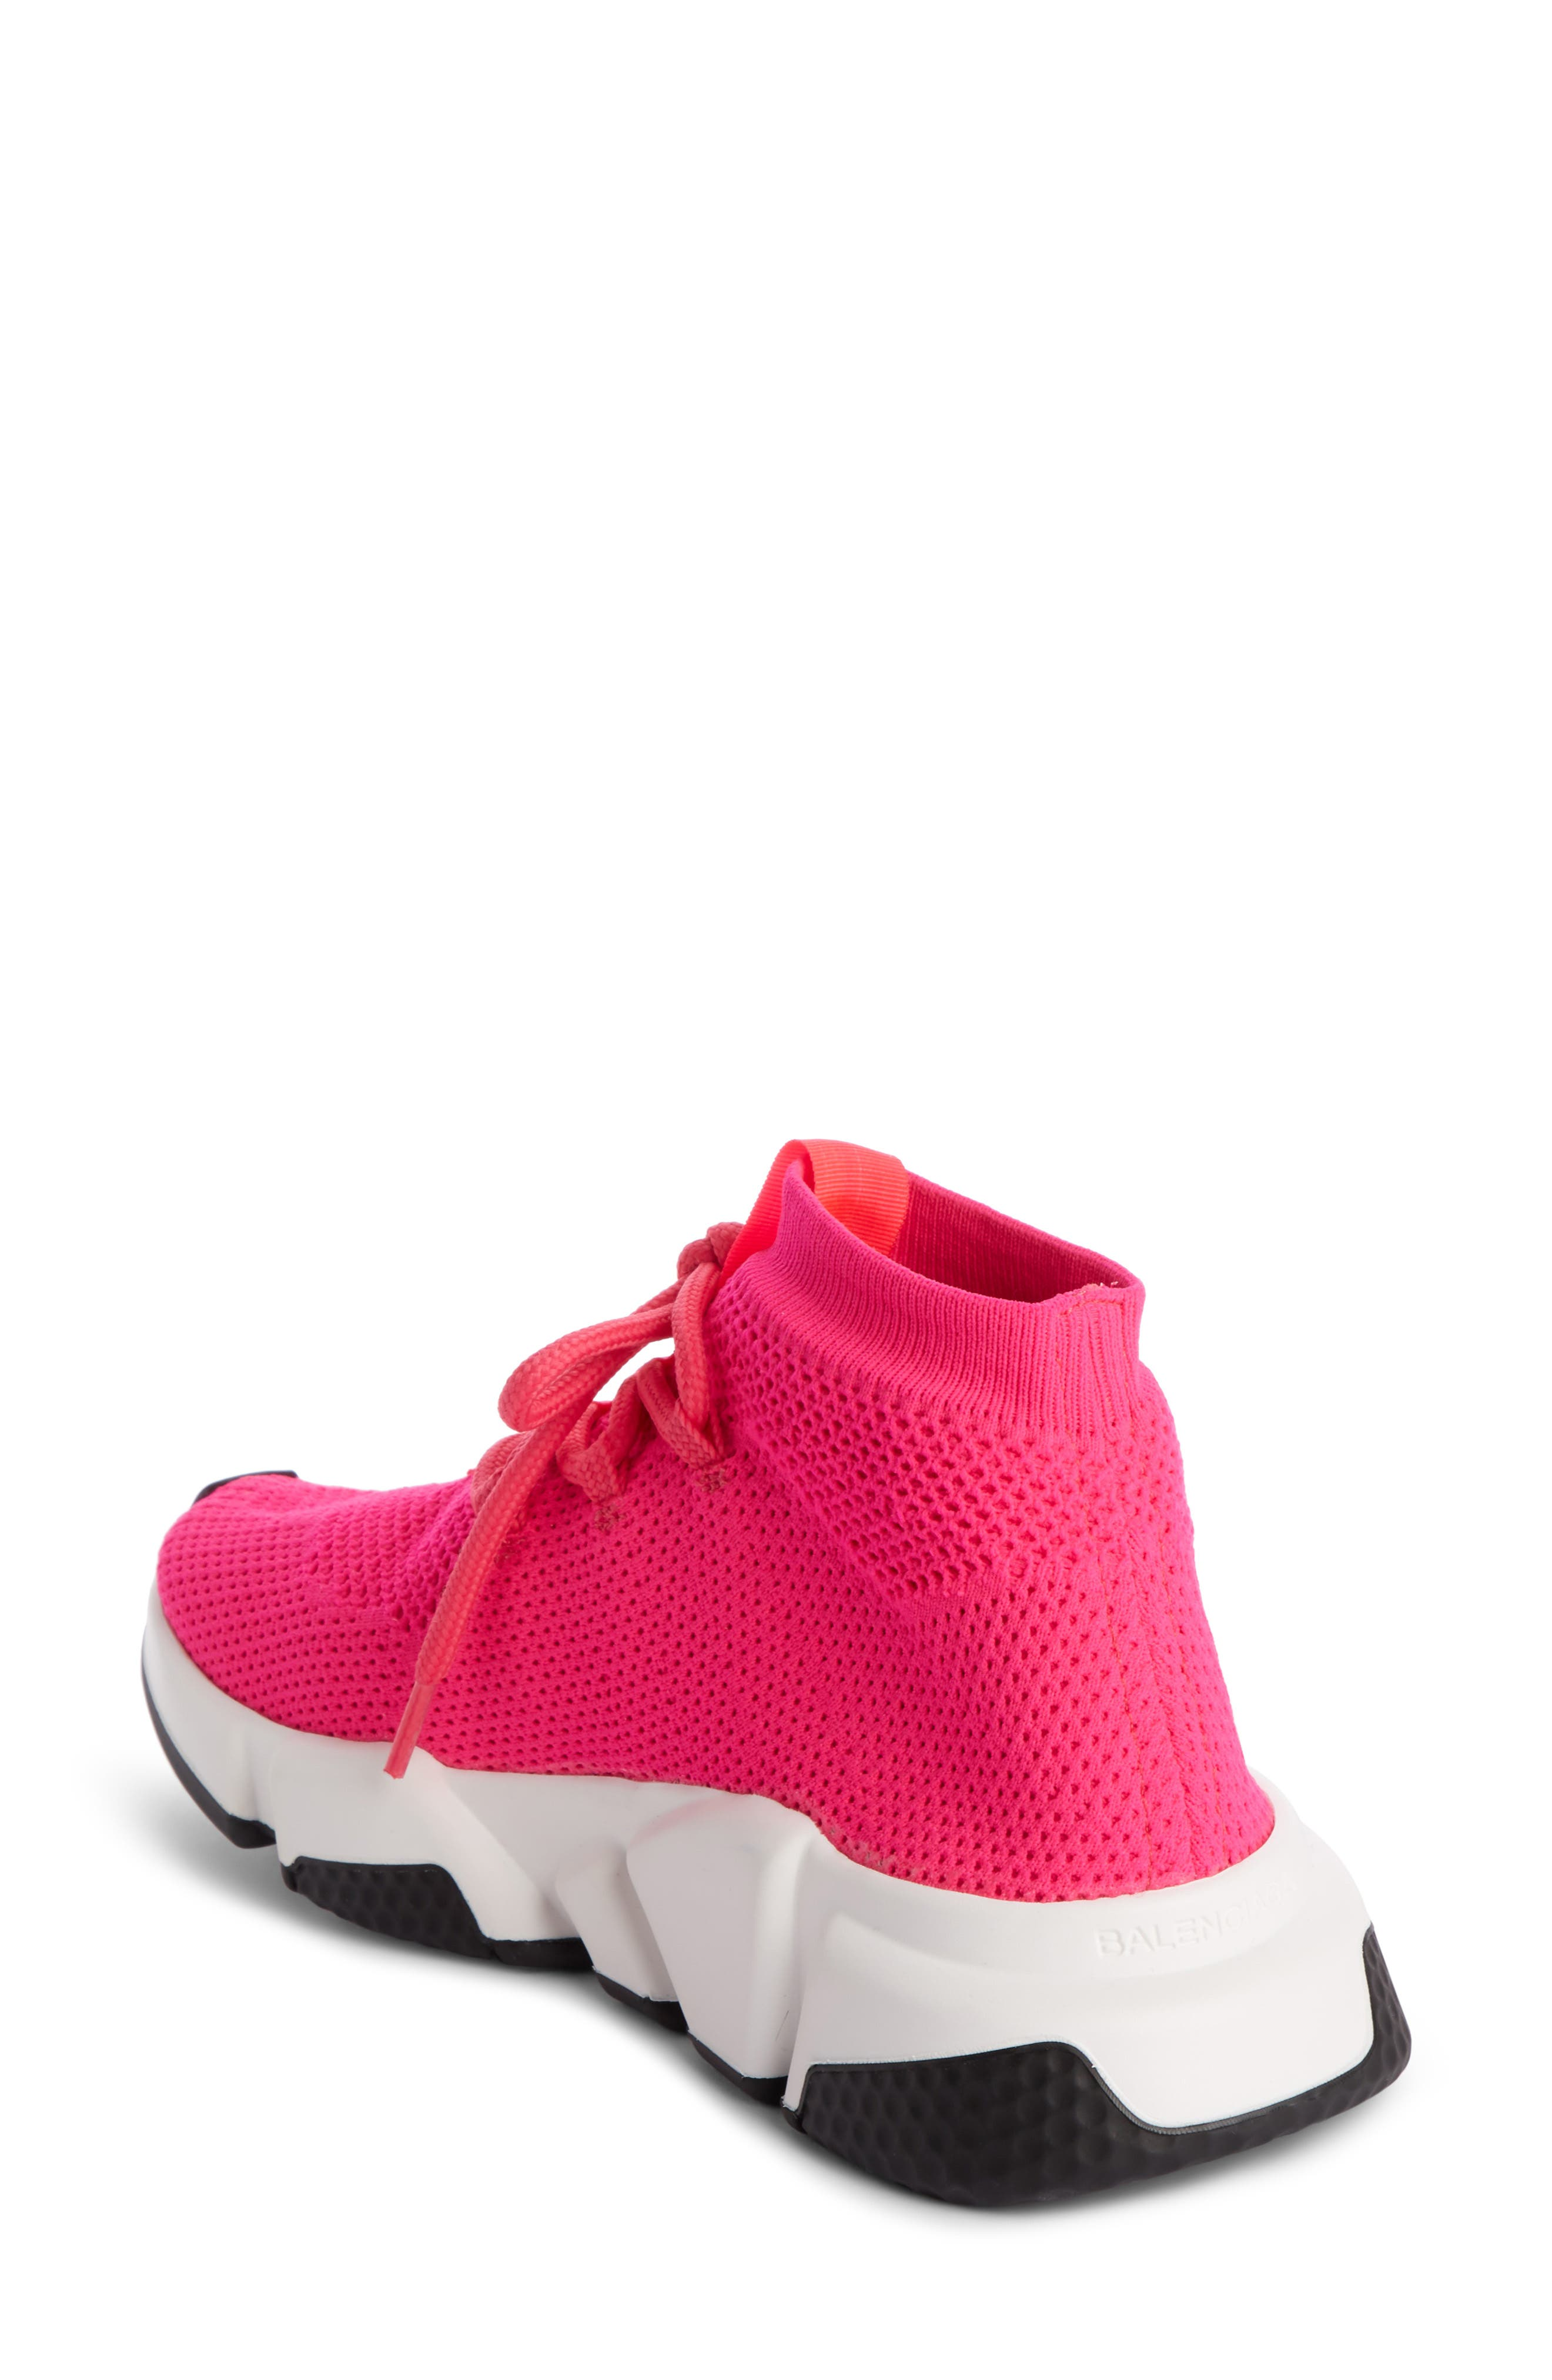 san francisco bc05d ef0f1 Women s Balenciaga Shoes   Nordstrom